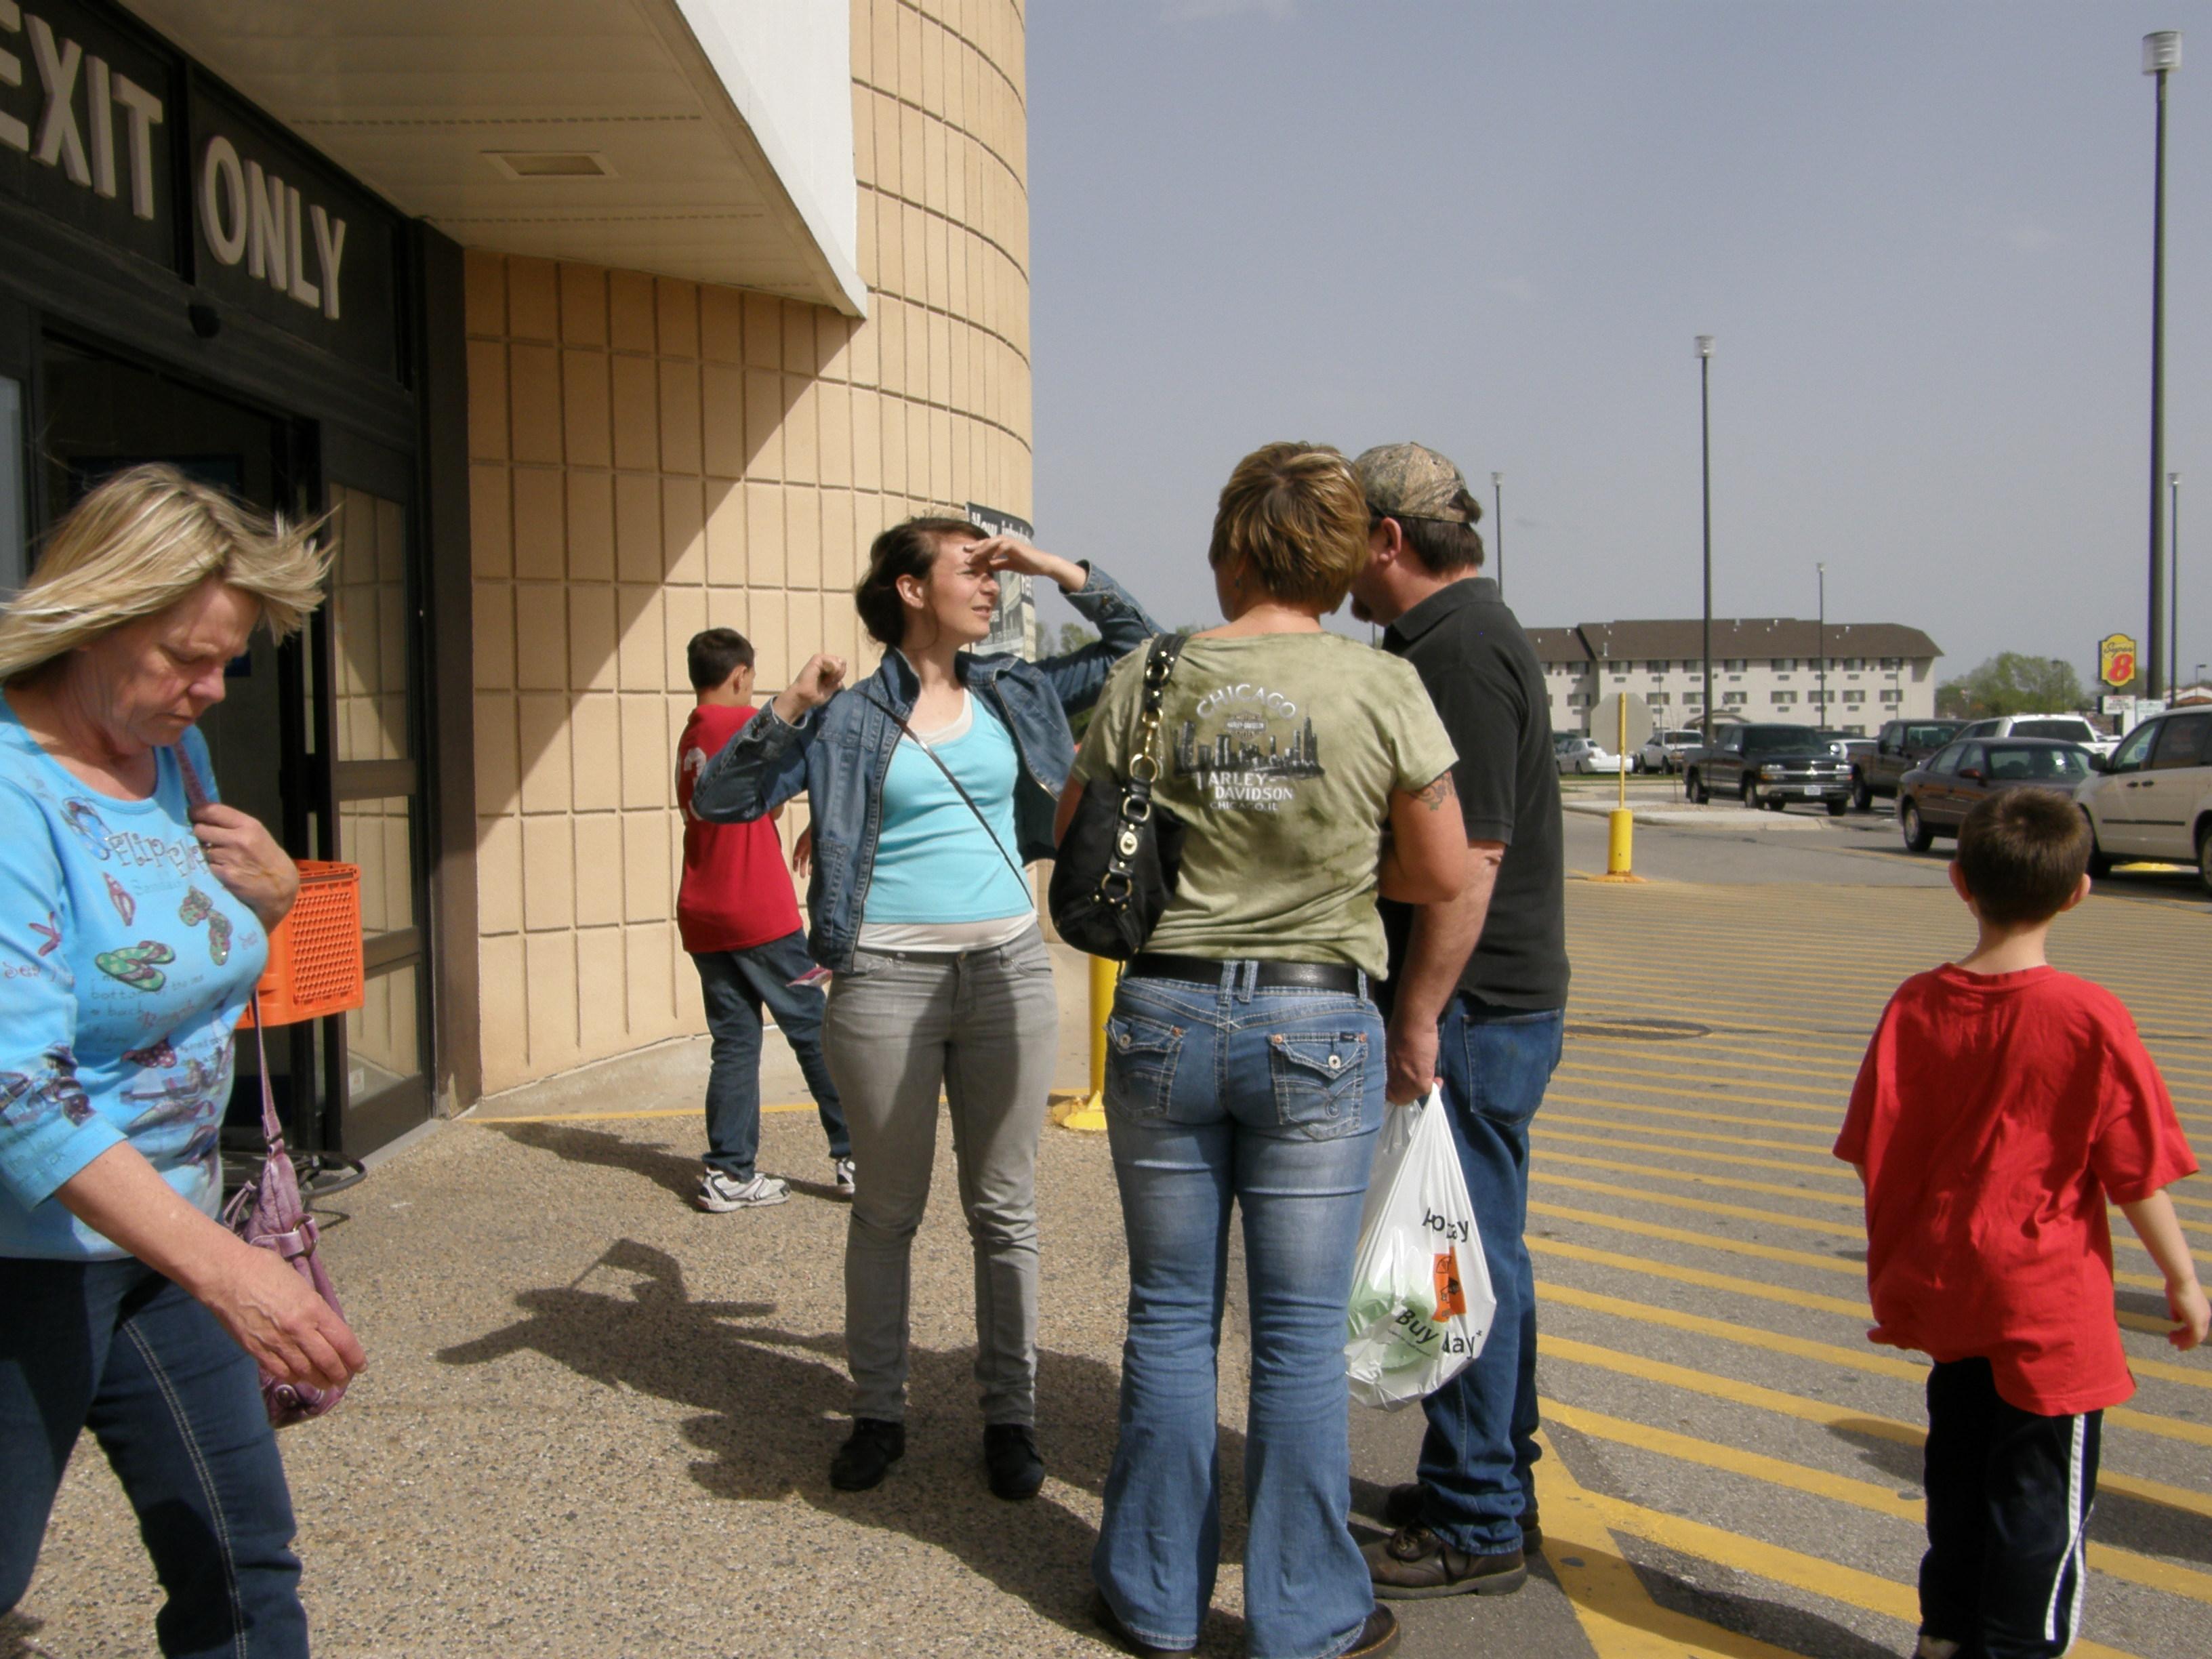 Singles in mason city iowa North Iowa Area Community College, NIACC - Mason City - Iowa